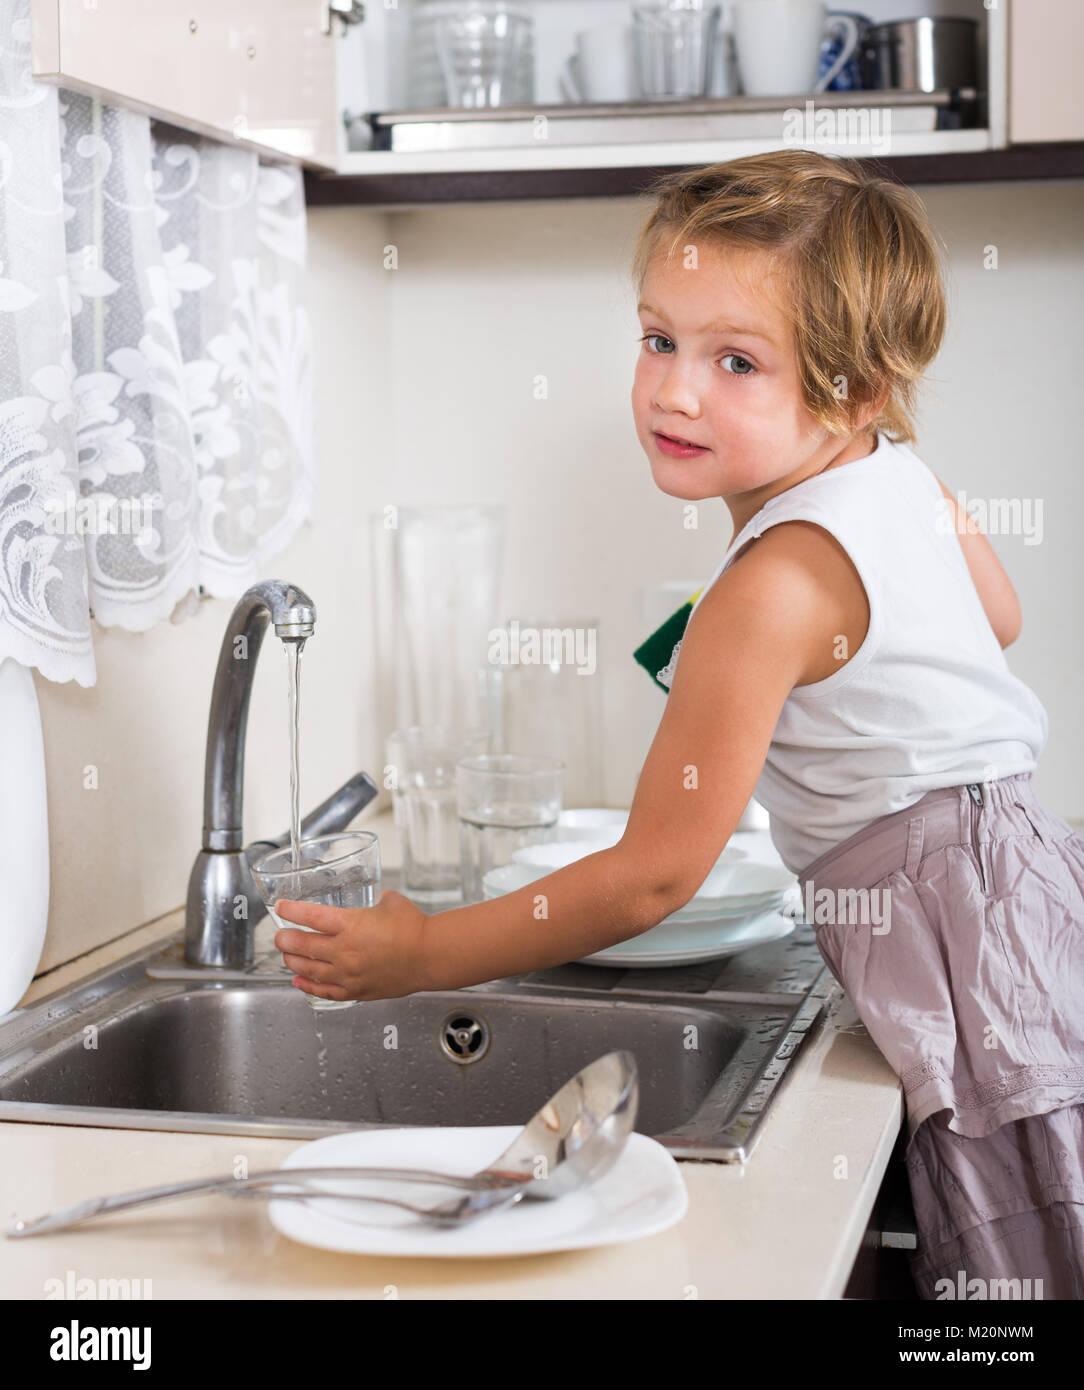 Washing Baby Dirty Water Stock Photos & Washing Baby Dirty Water ...